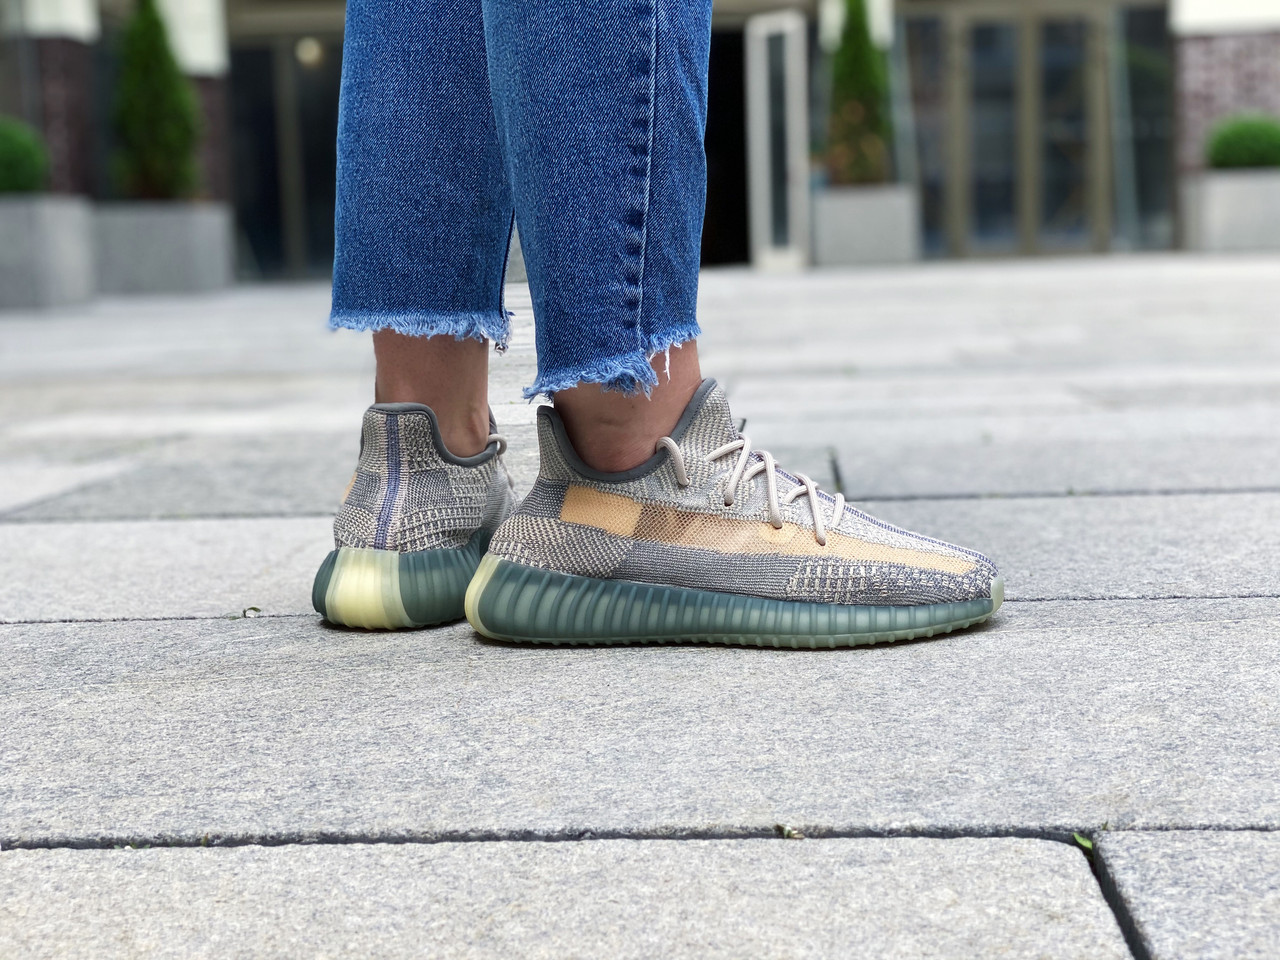 "Кроссовки женские Adidas Yeezy 350 Boost V2 ""Israfil"" / FZ5421 (Размеры:36,38,38,5)"